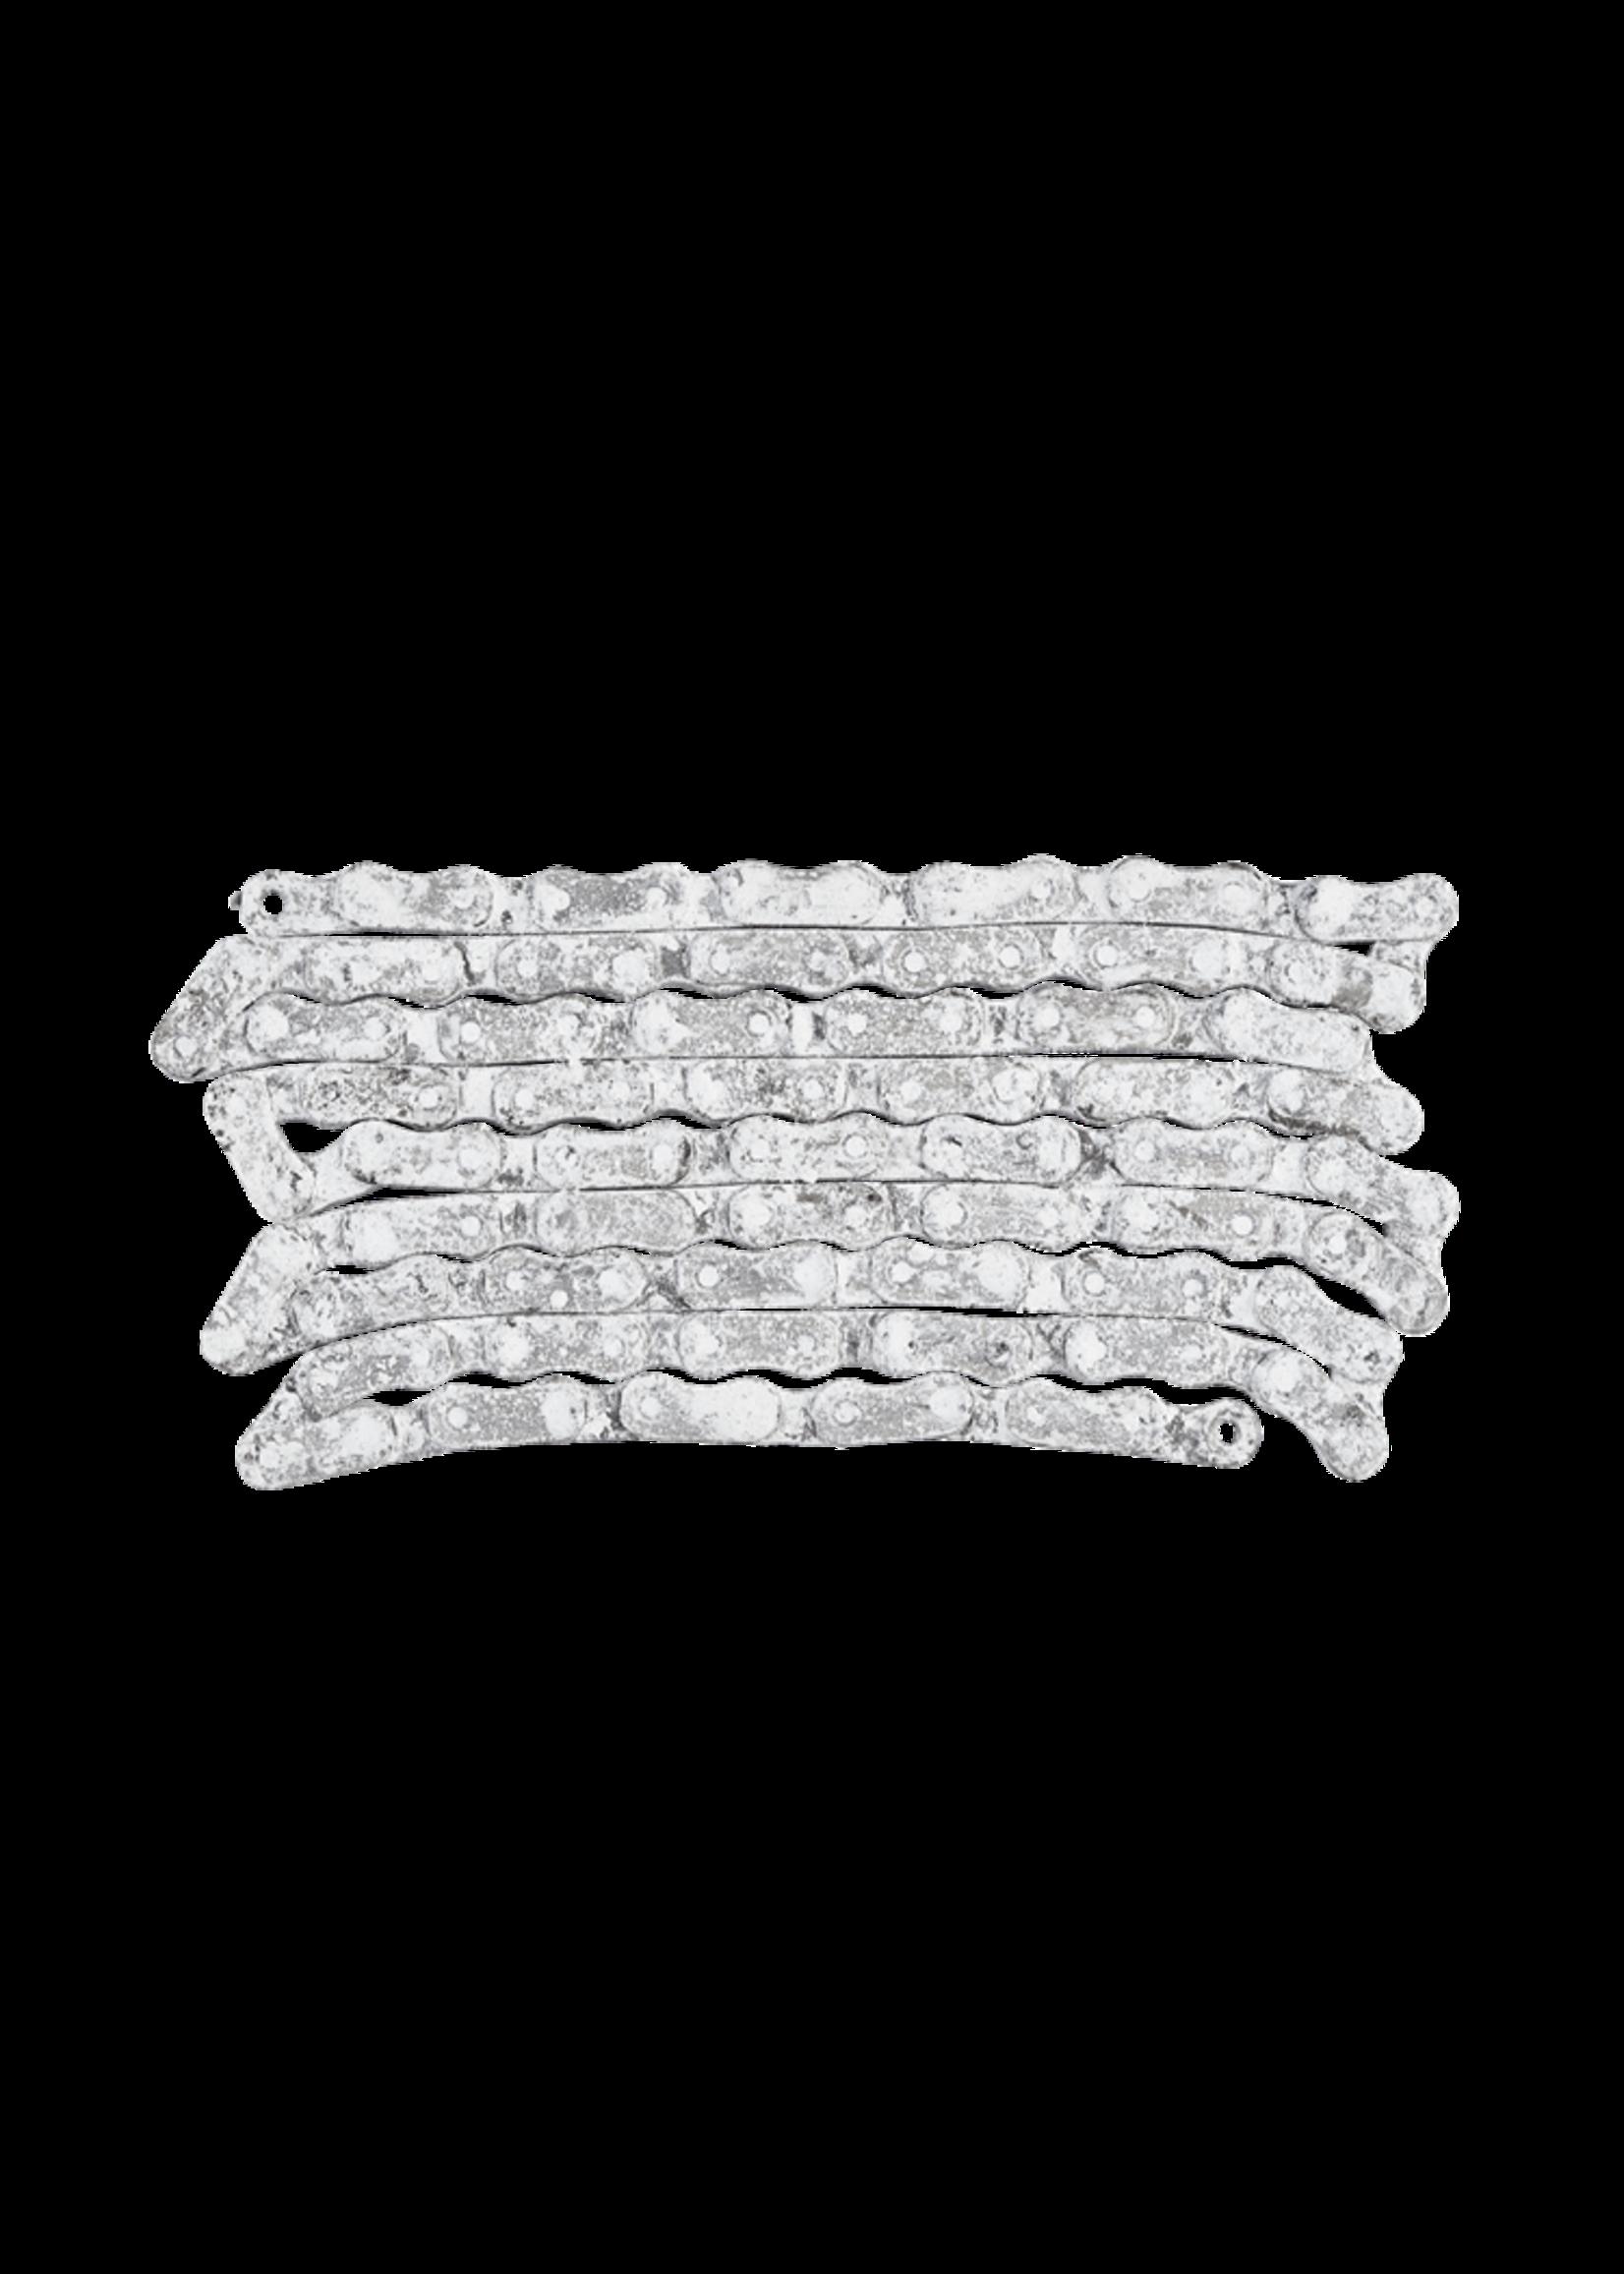 ceramicspeed CERAMICSPEED CHAINE SHIMANO 11v